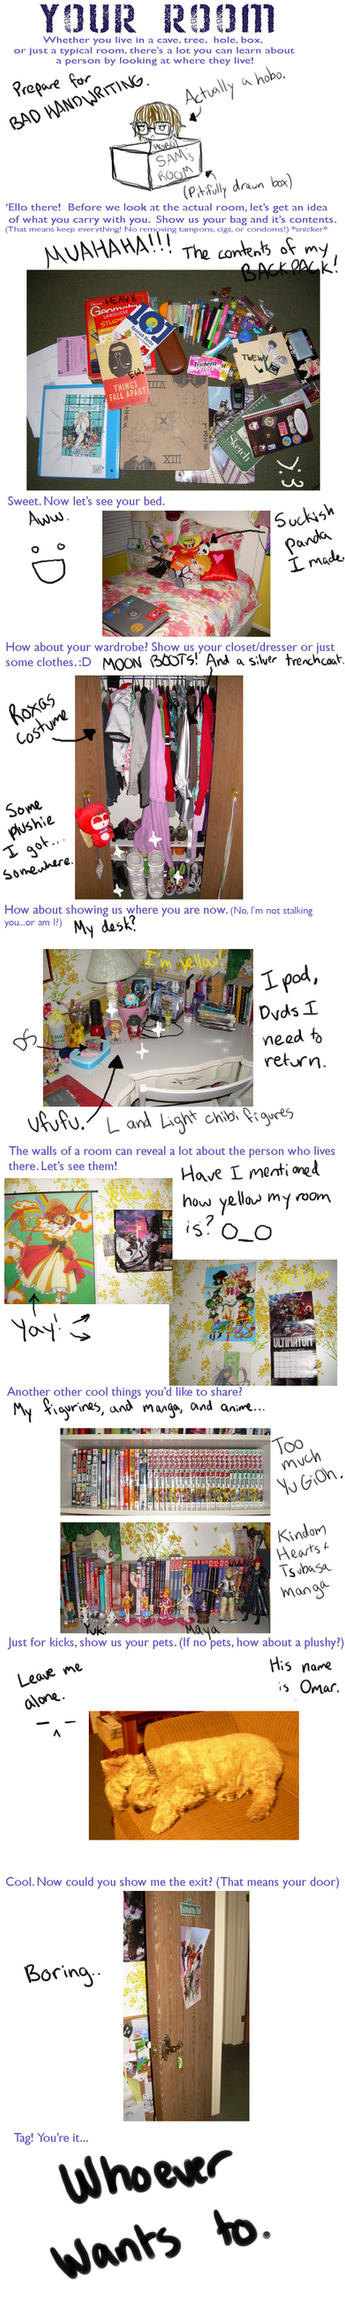 Room Meme by PandaSam